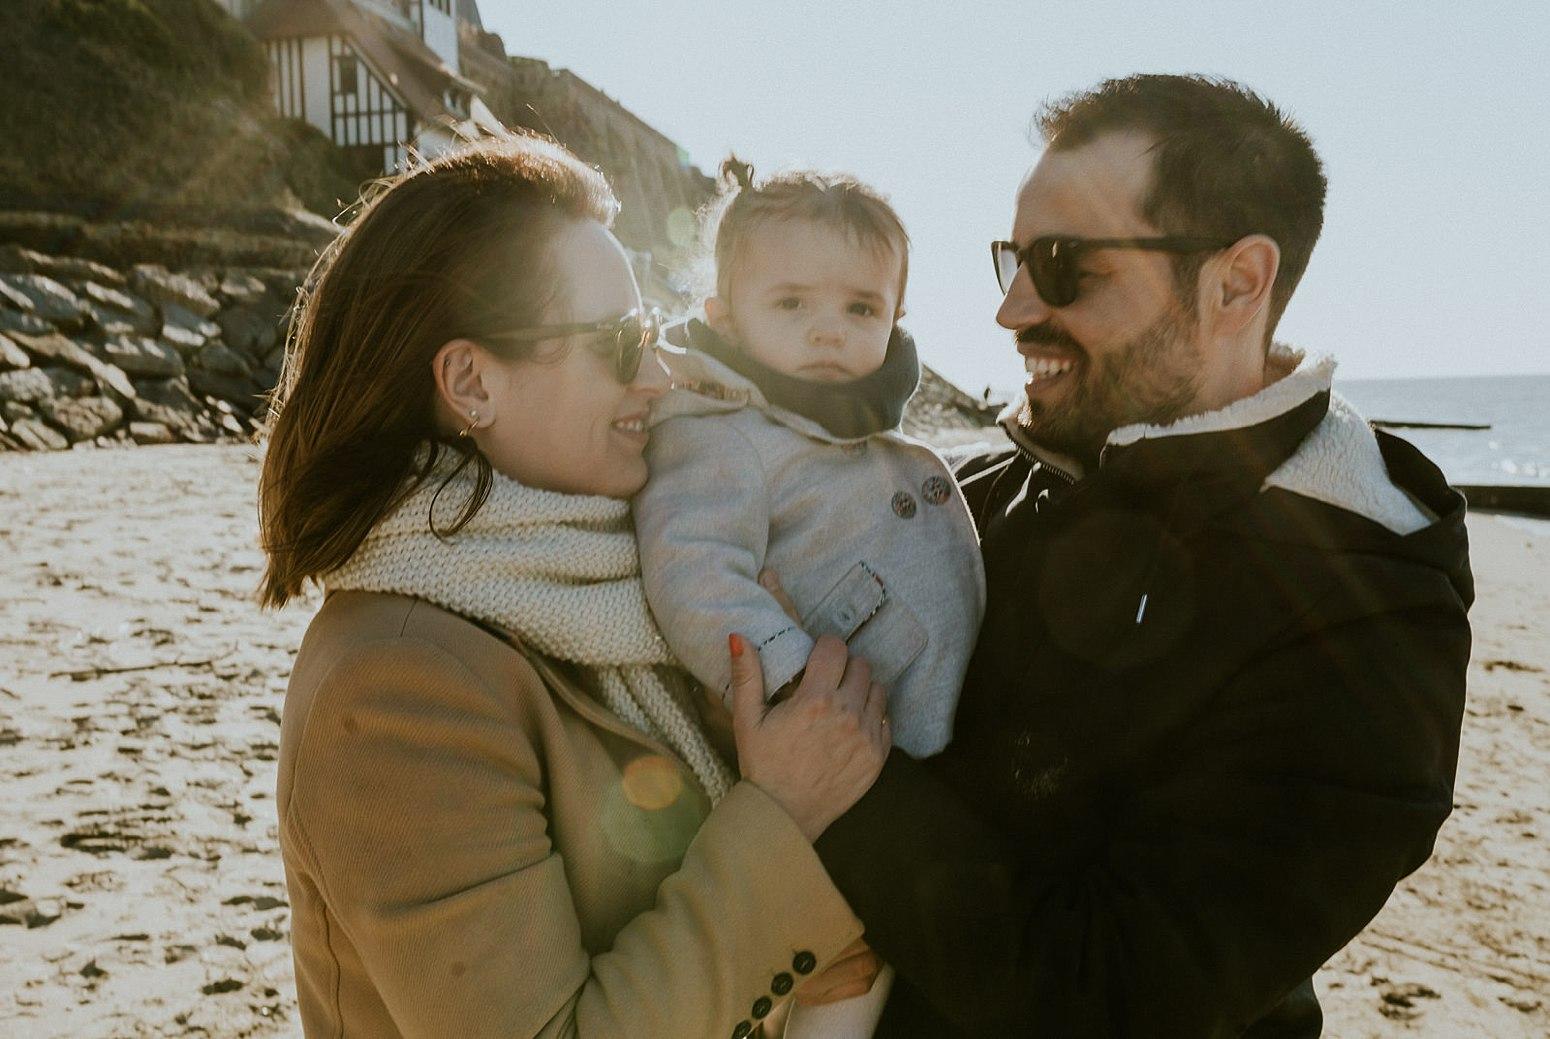 photographe-famille-normandie-plage_0015.jpg